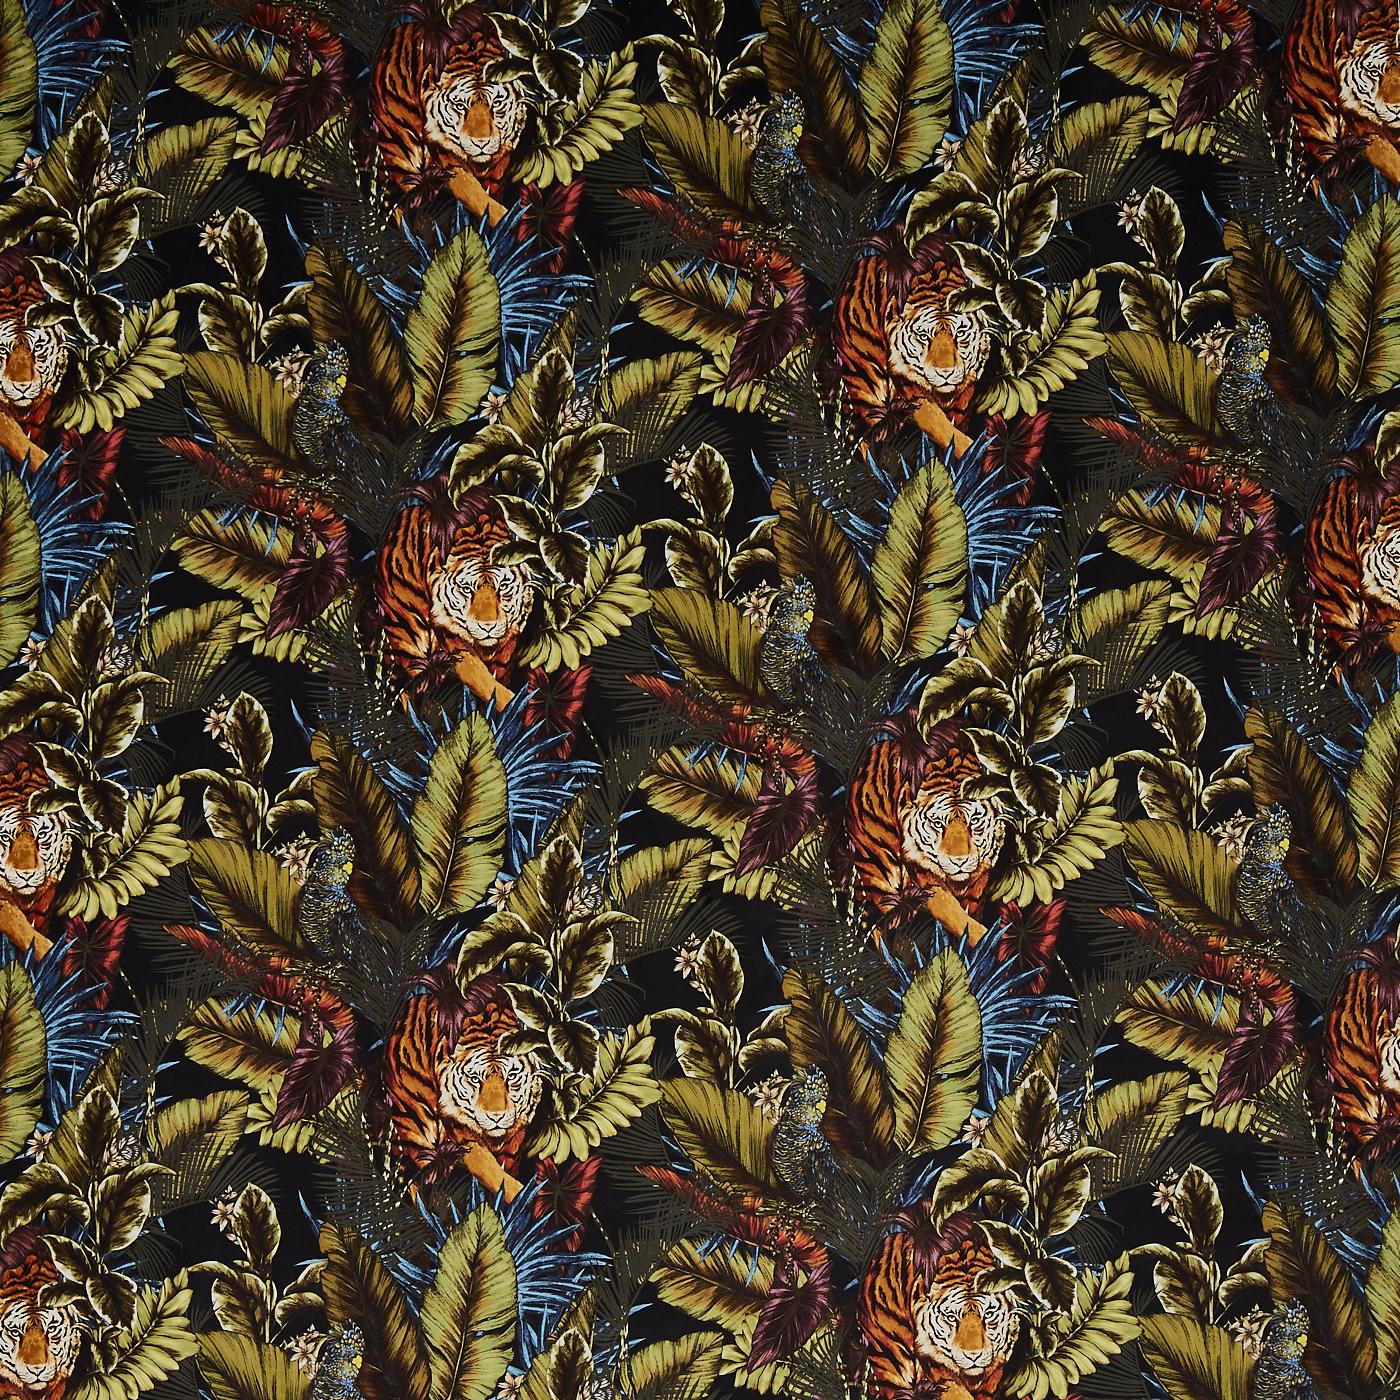 Safari Made to measure roman blind in prestigious textiles Tiger Ivory fabric